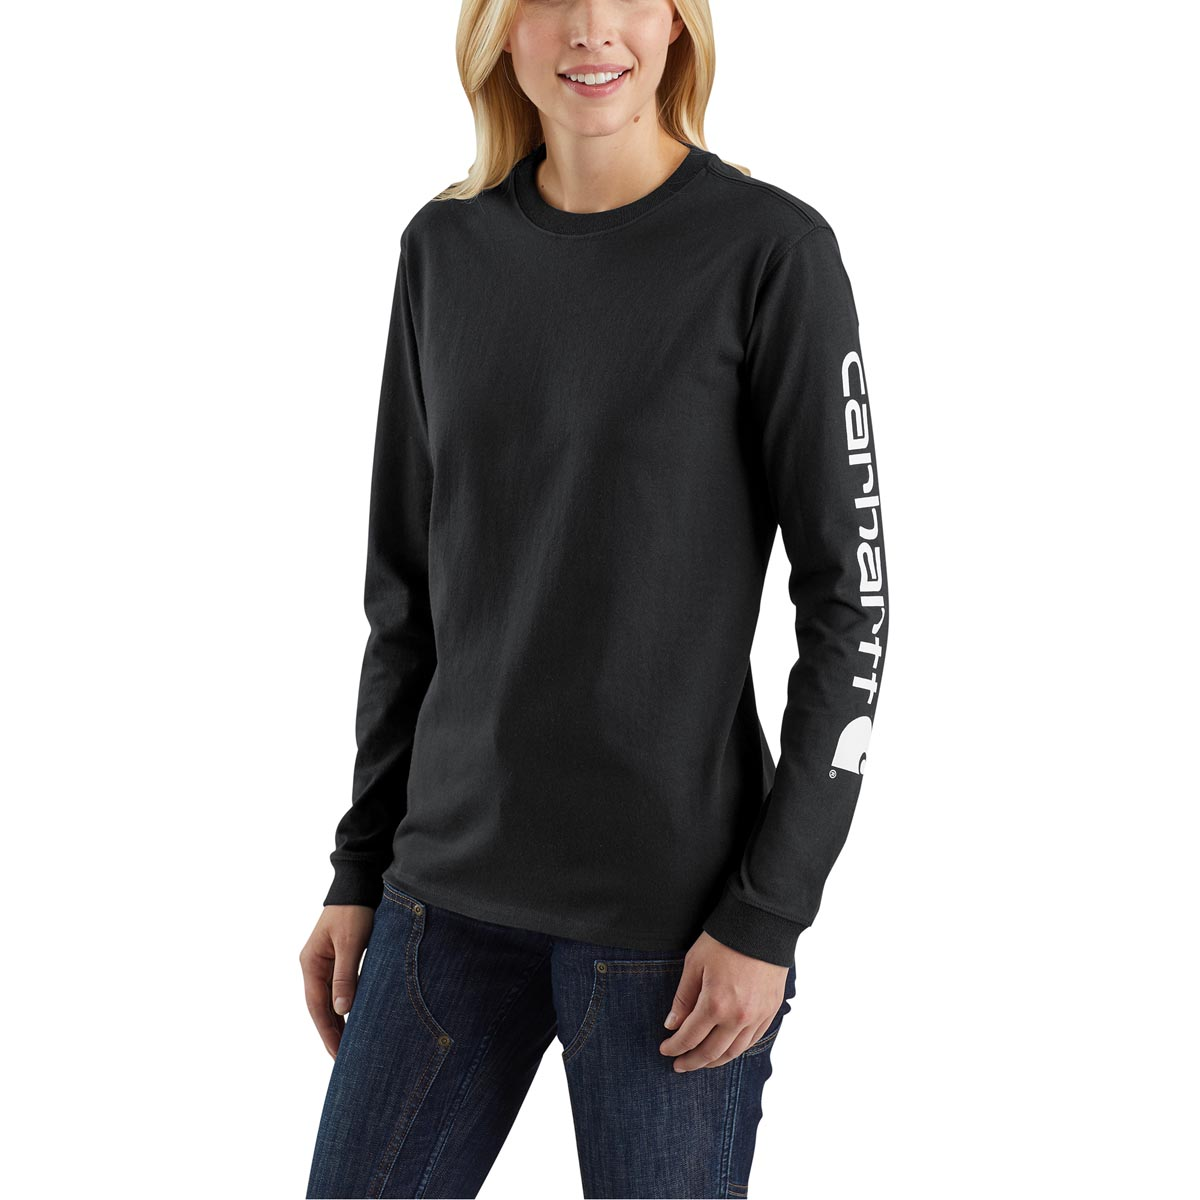 NWT Tuff Guys Boys 2 PC SET Long Sleeve Active Sweater Shirt /& Pants Sz 5-6 or 7